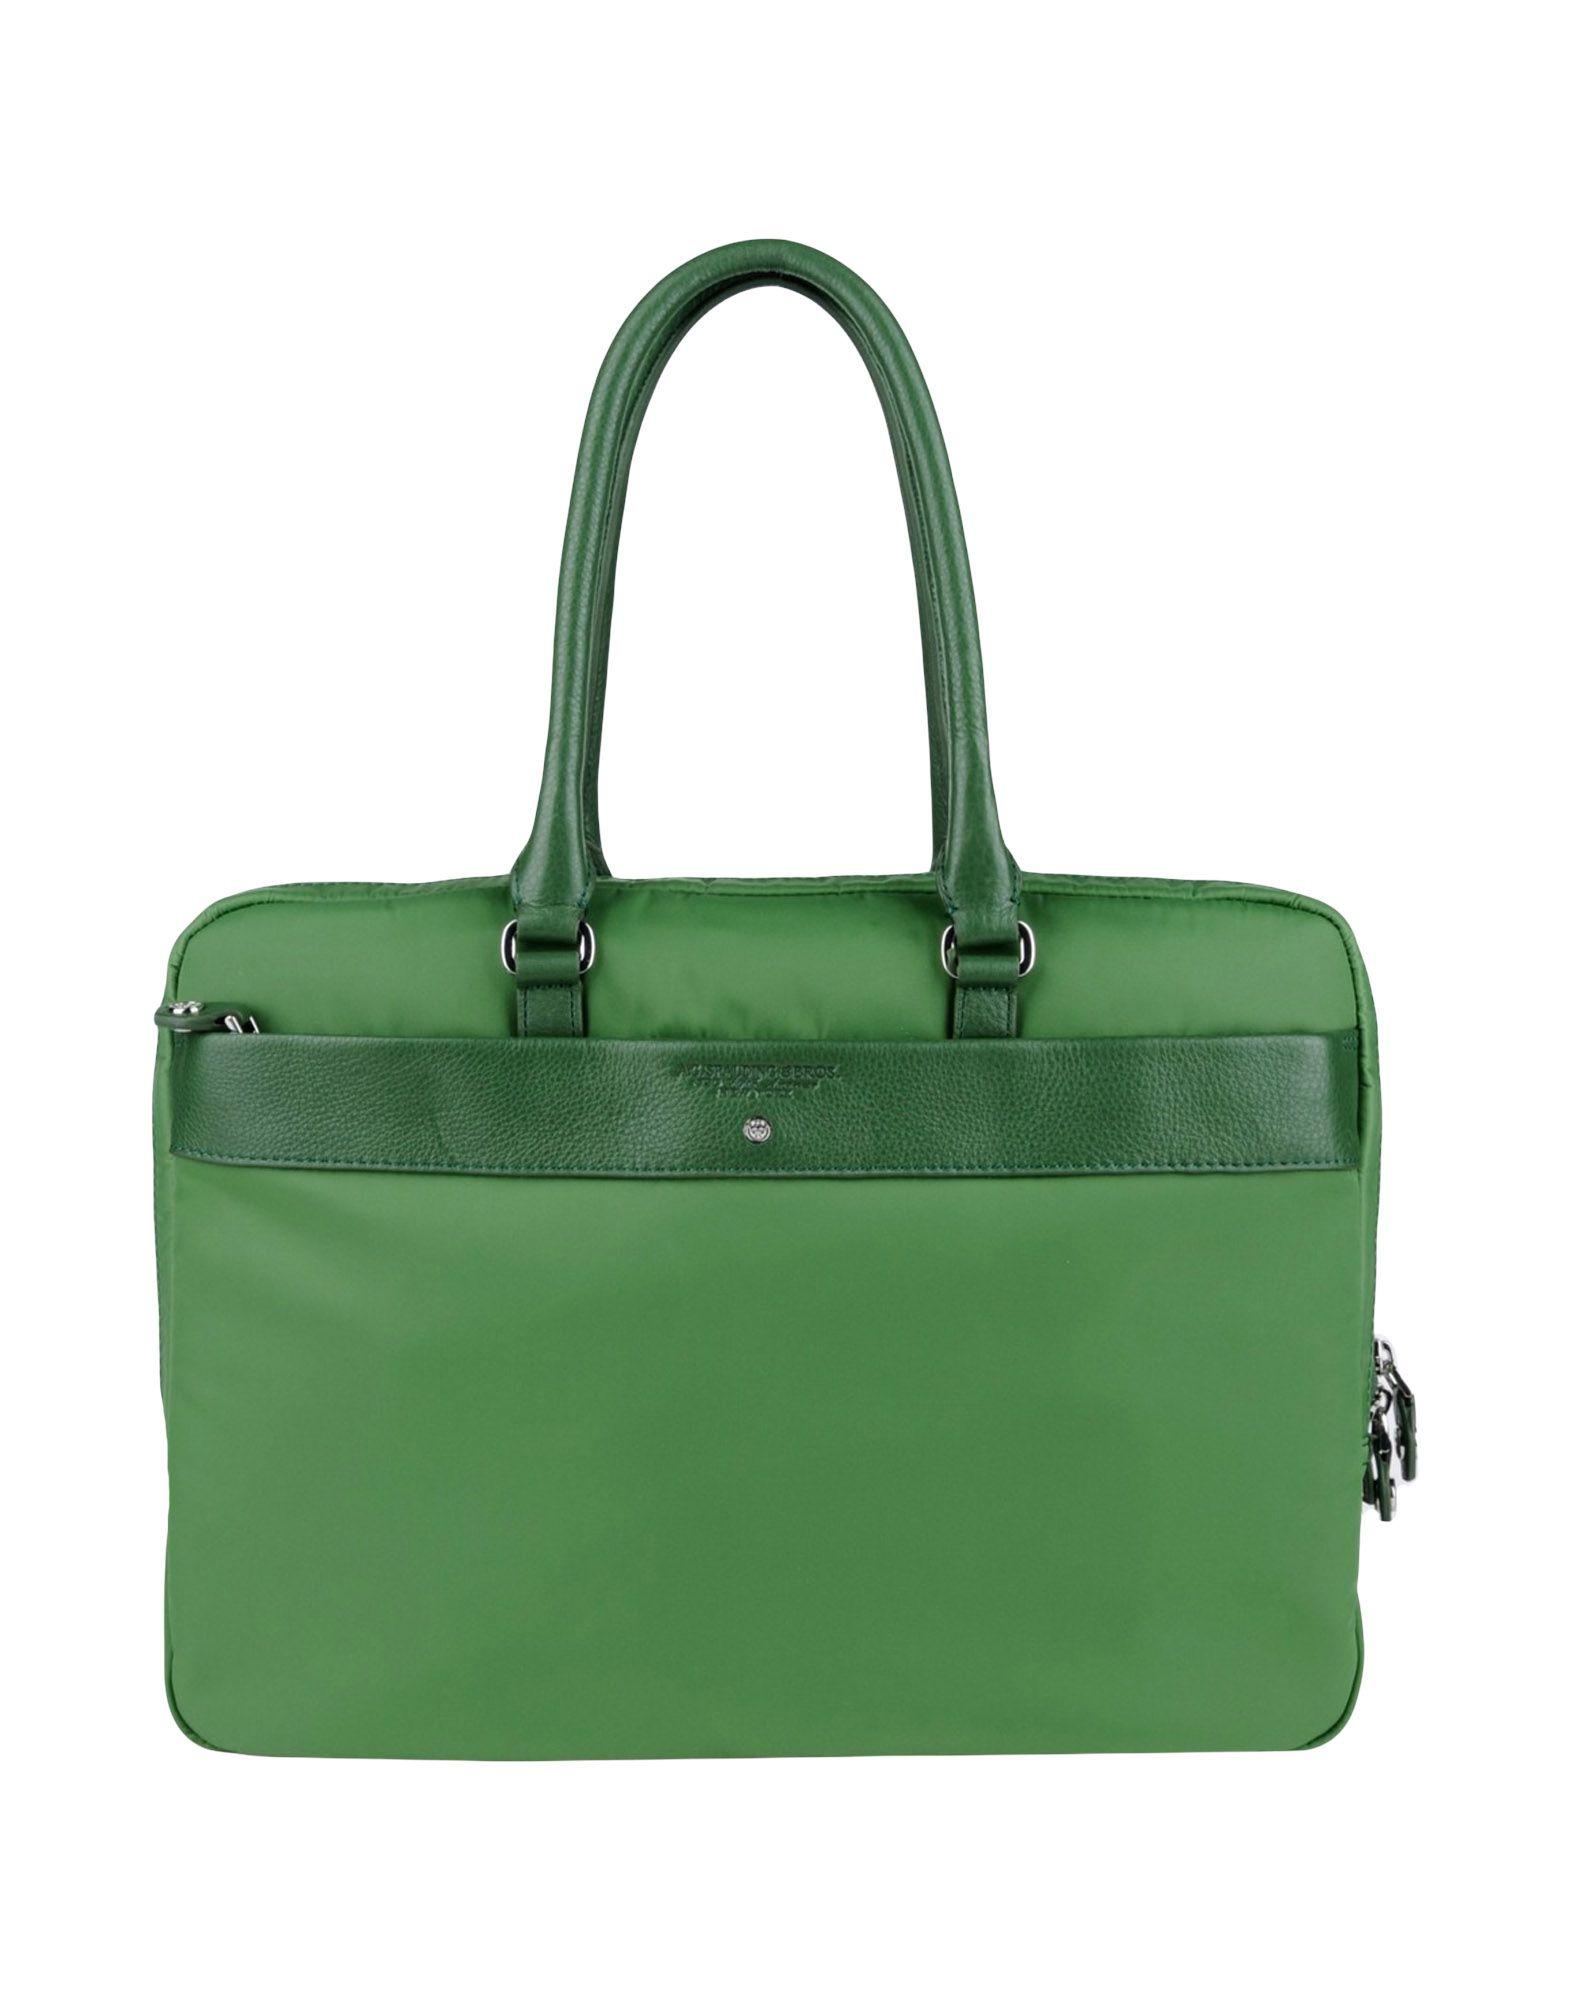 A.G. SPALDING & BROS. 520 FIFTH AVENUE  New York Деловые сумки kate spade new york сумка на руку